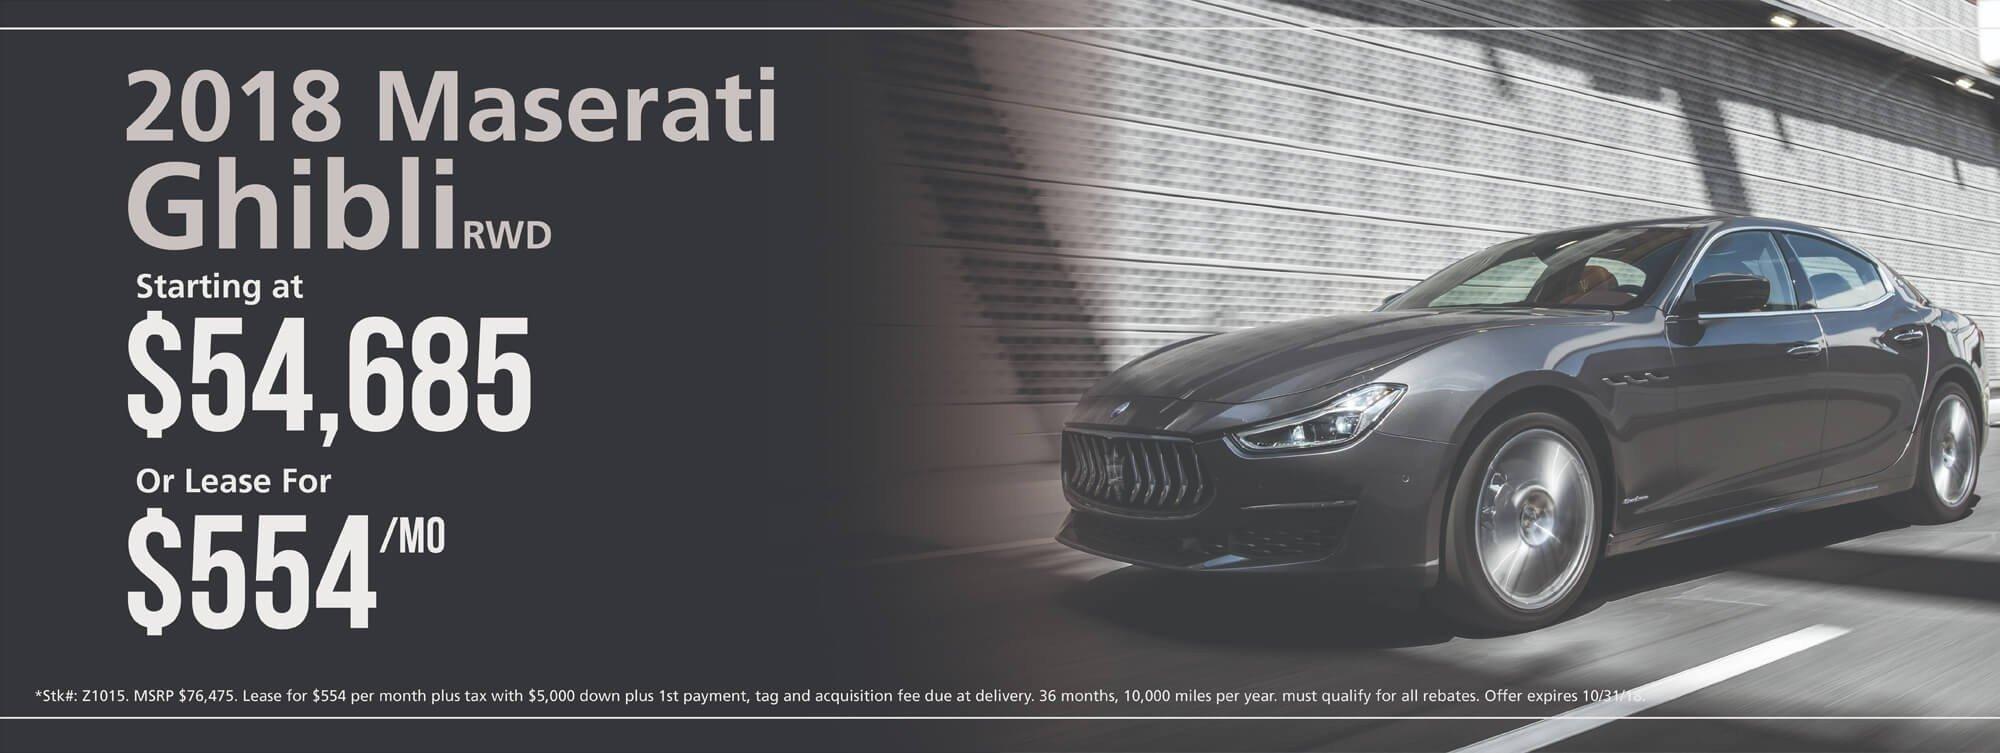 2019 Maserati Ghibli RWD